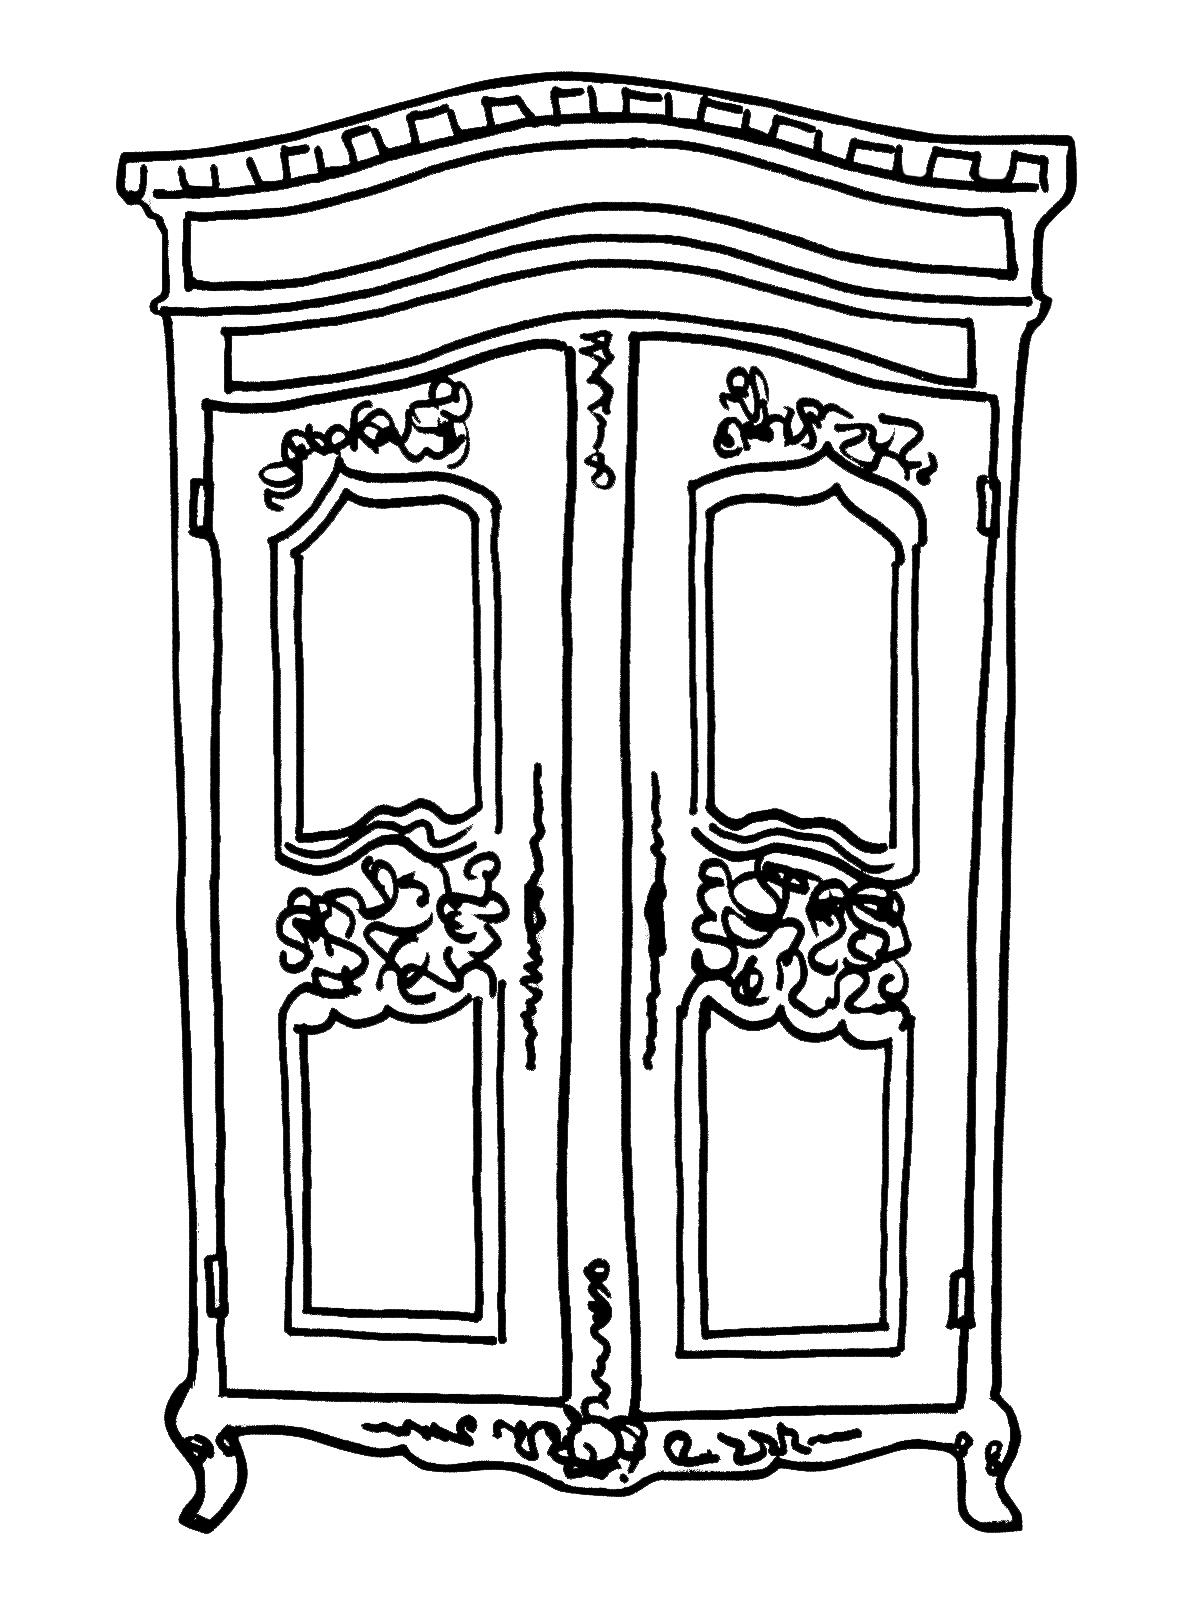 Dibujo de ropero para colorear - Imagui